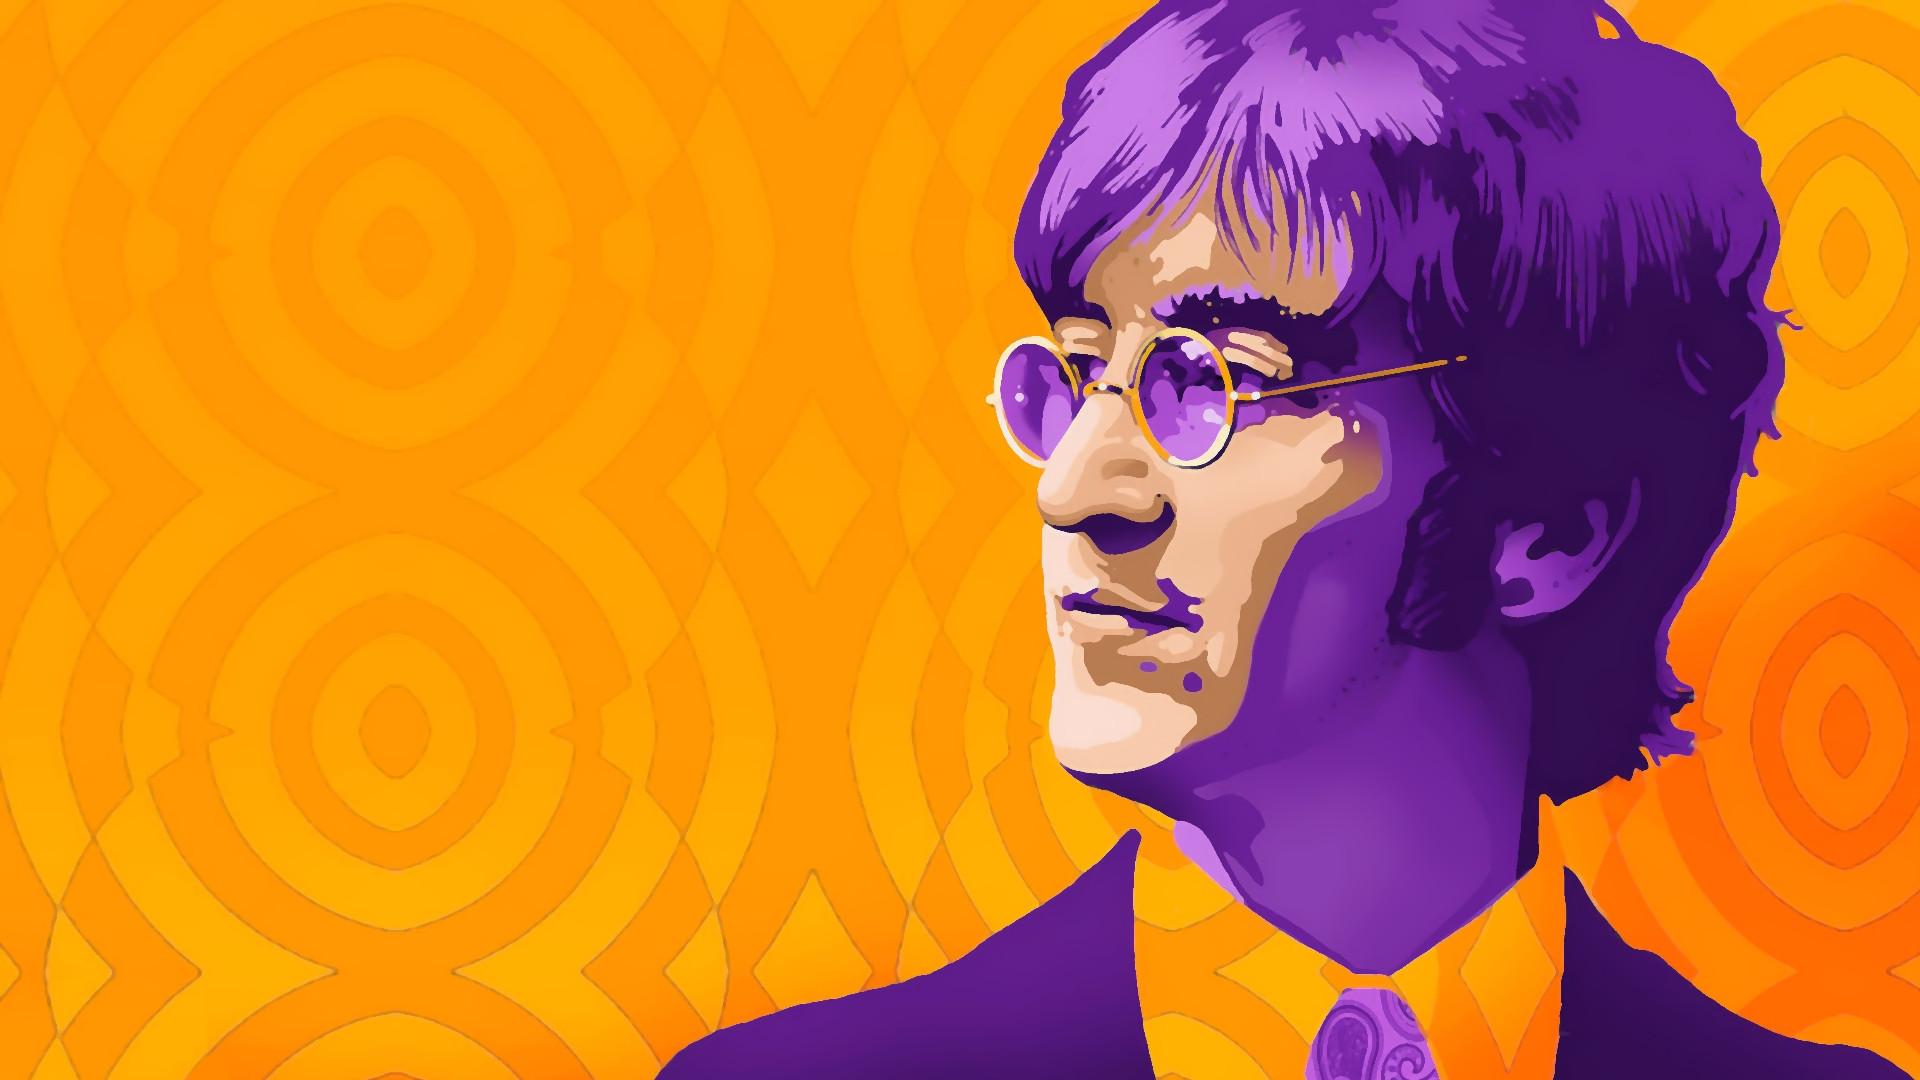 11 Grandes Lições De Vida Que John Lennon Nos Ensinou